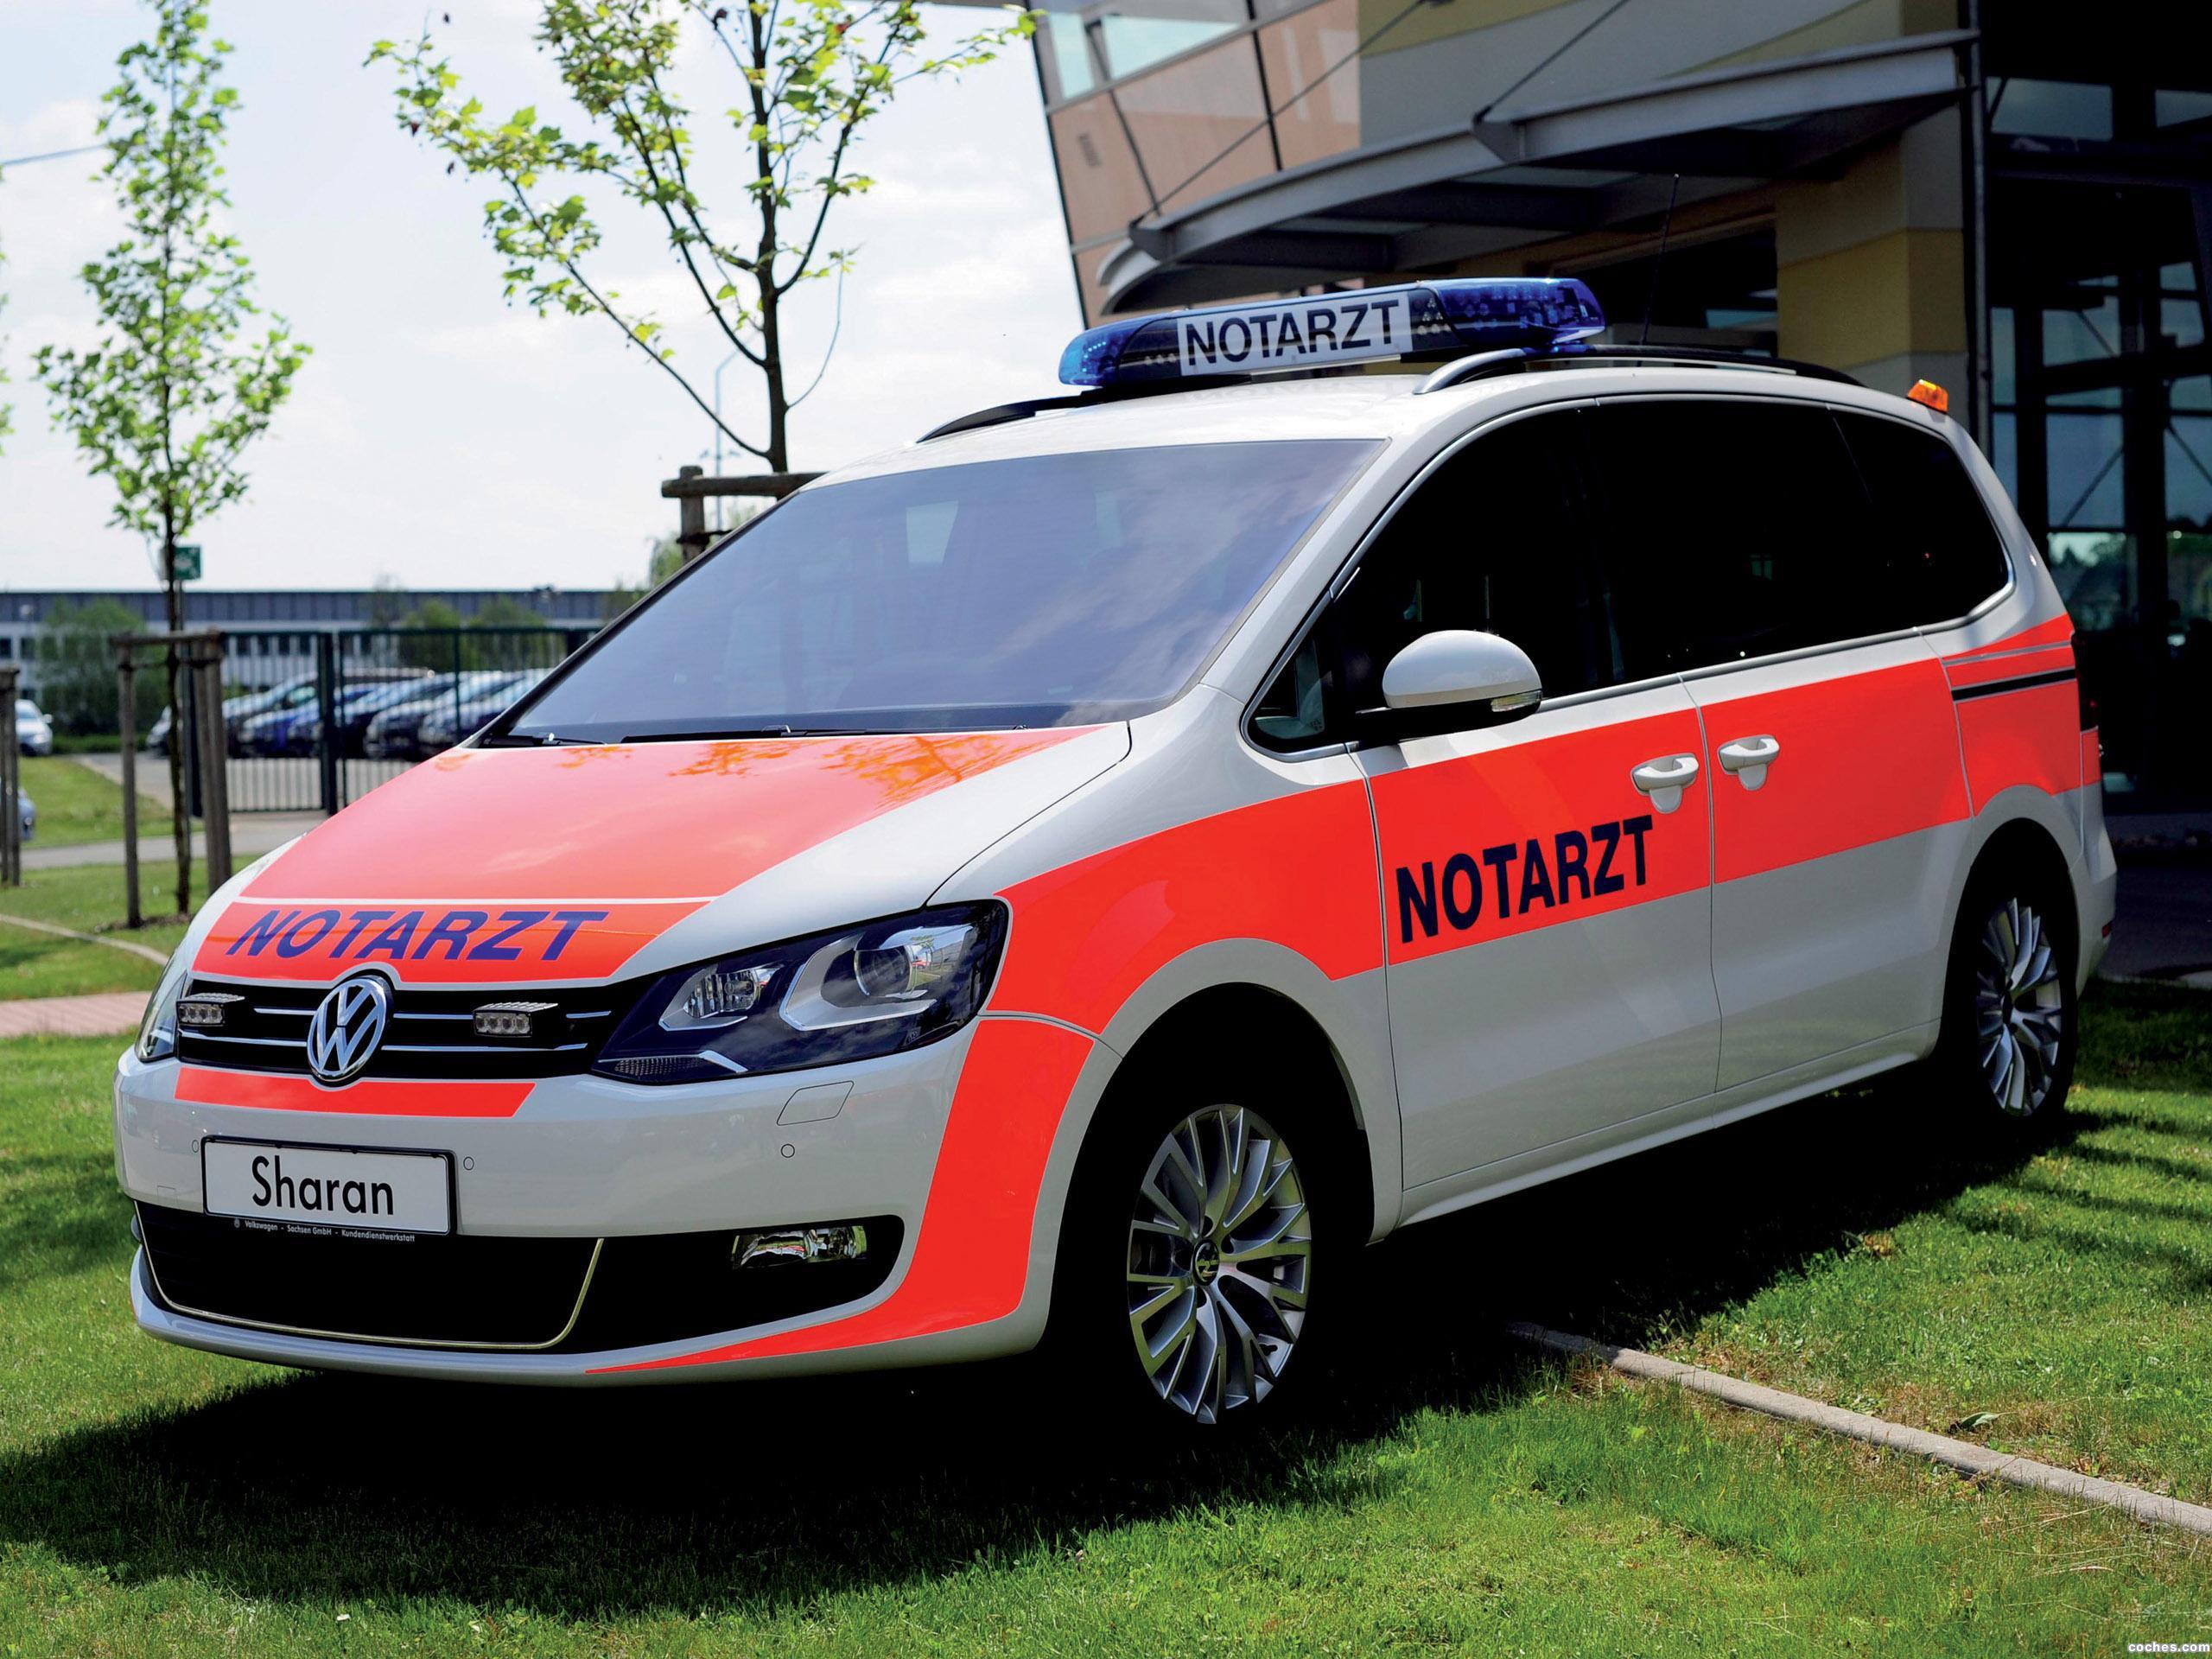 volkswagen_sharan-notarzt-2012_r4